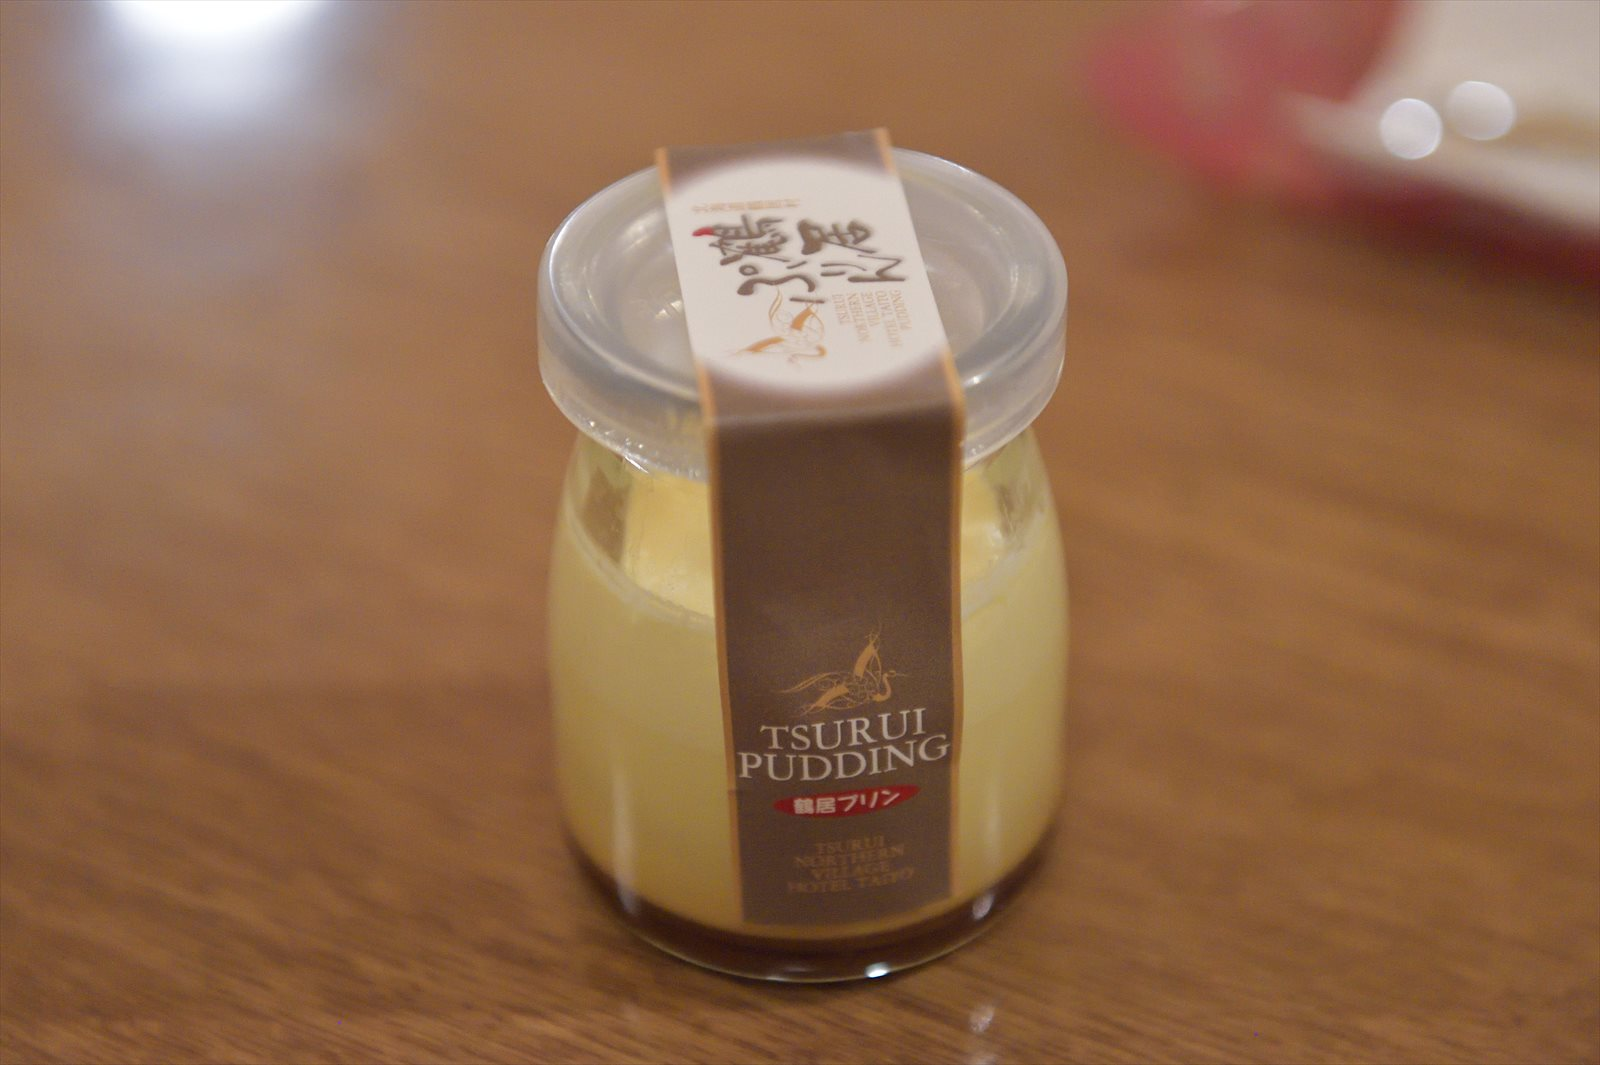 【鶴居村】HOTEL TAITO_a0145819_2193958.jpg